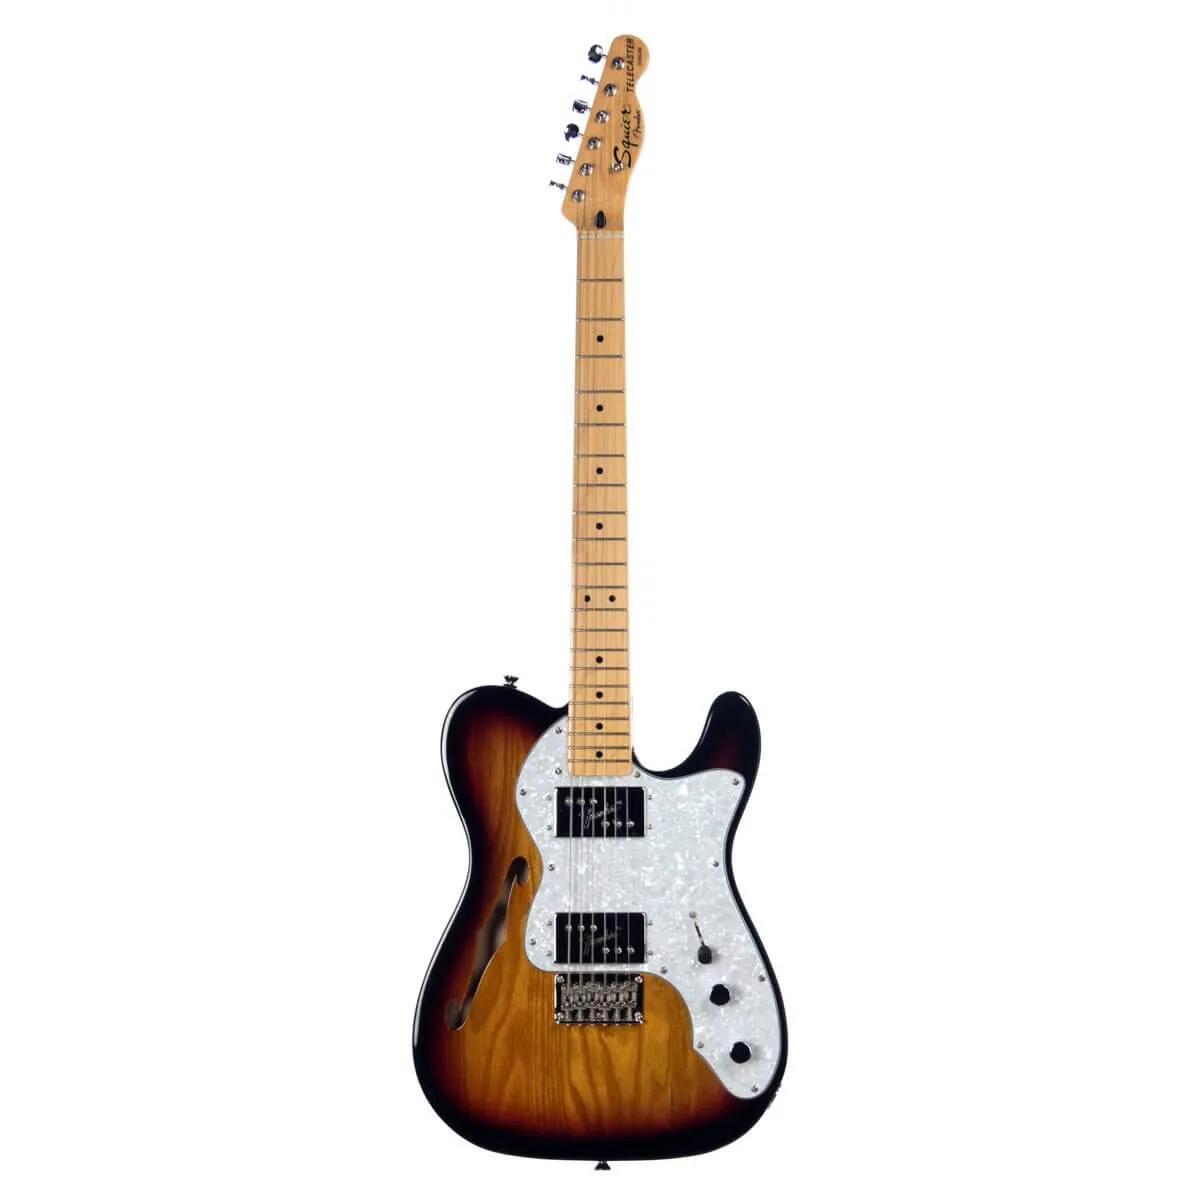 Guitarra Fender Squier Vintage Modified Telecaster Thinline 72 Sunburst